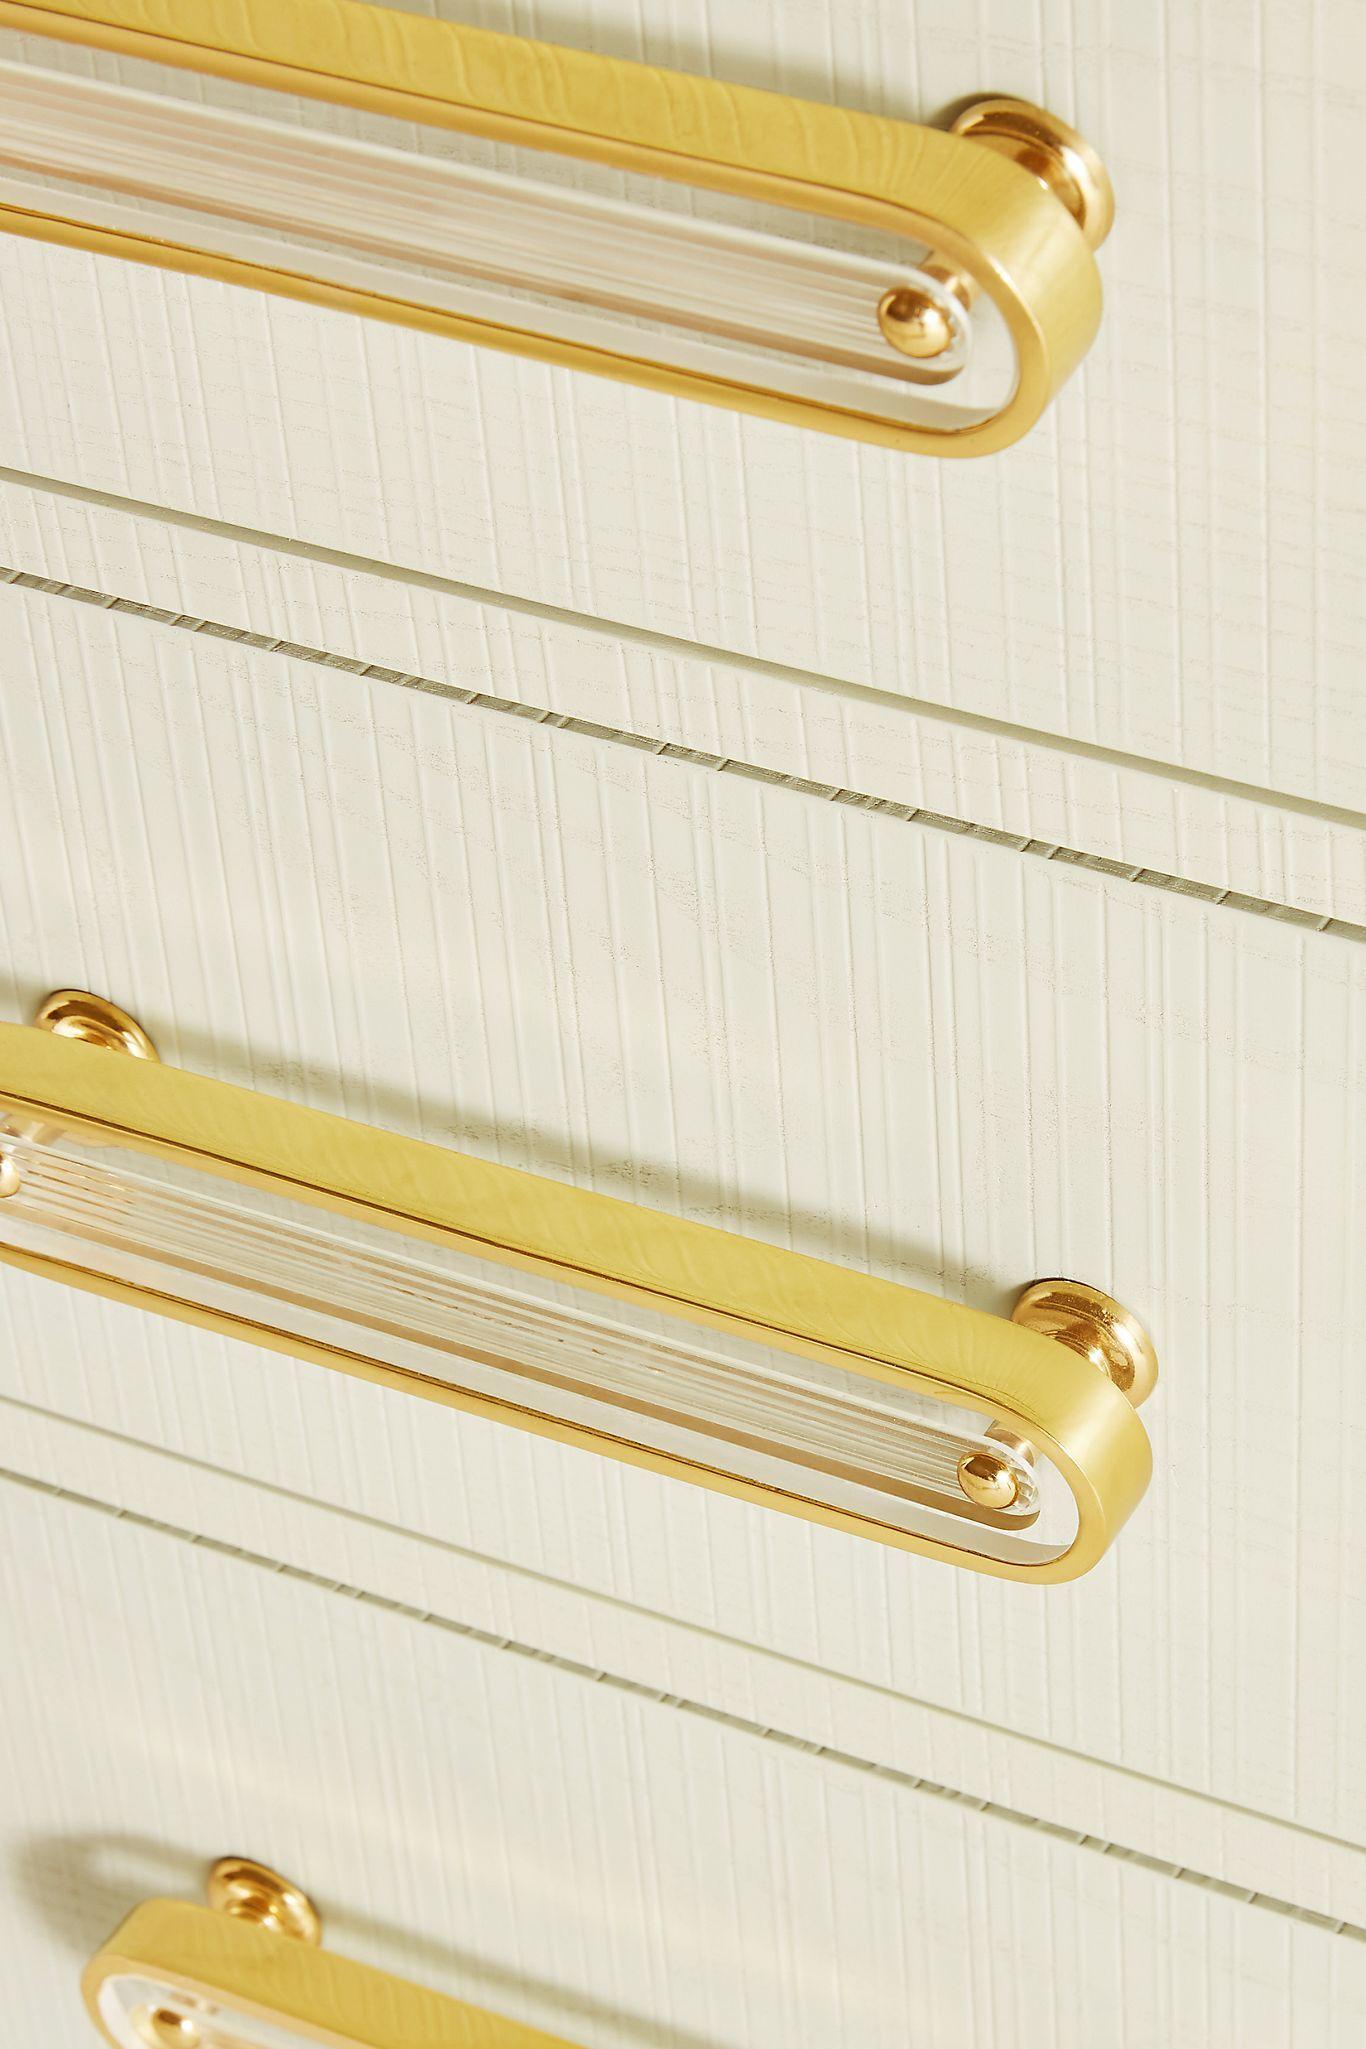 Odetta NineDrawer Dresser in 2020 Dresser drawers